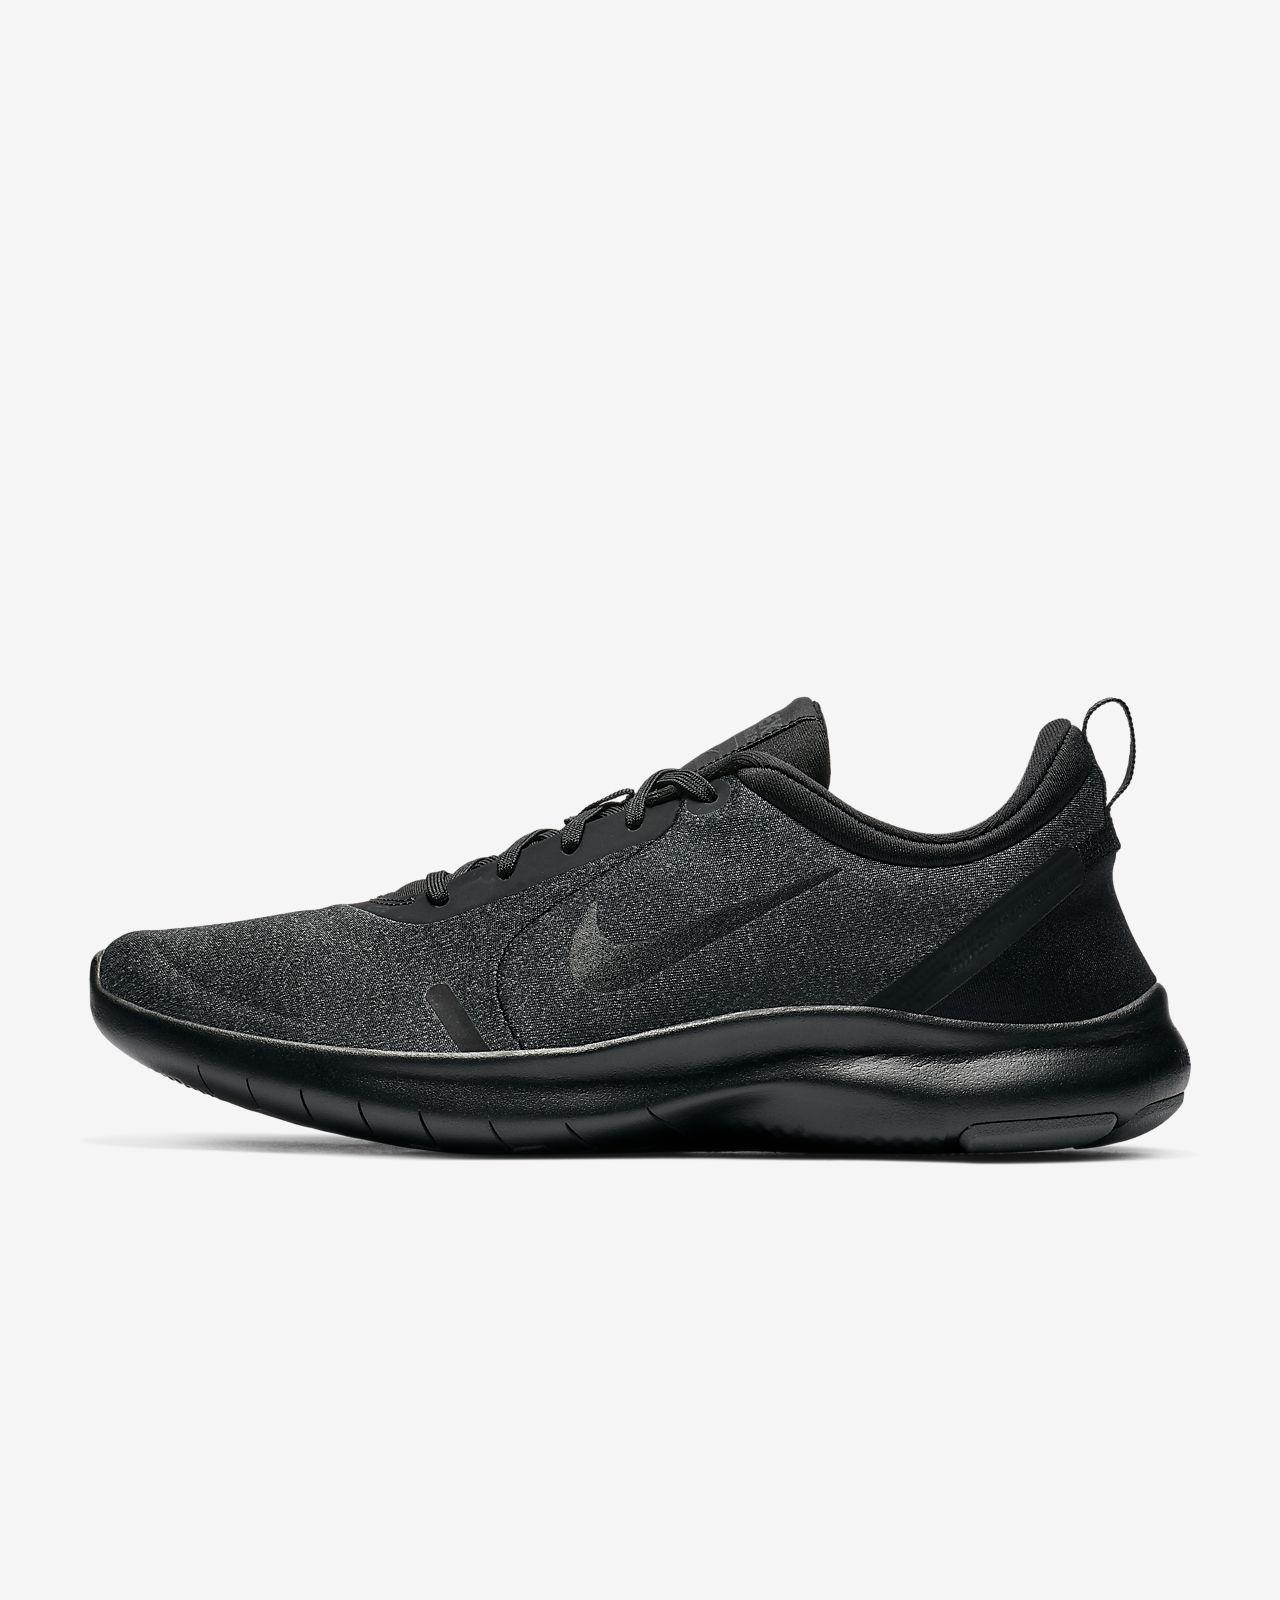 1daf2e44cd86 Nike Flex Experience RN 8 Men s Running Shoe. Nike.com BE